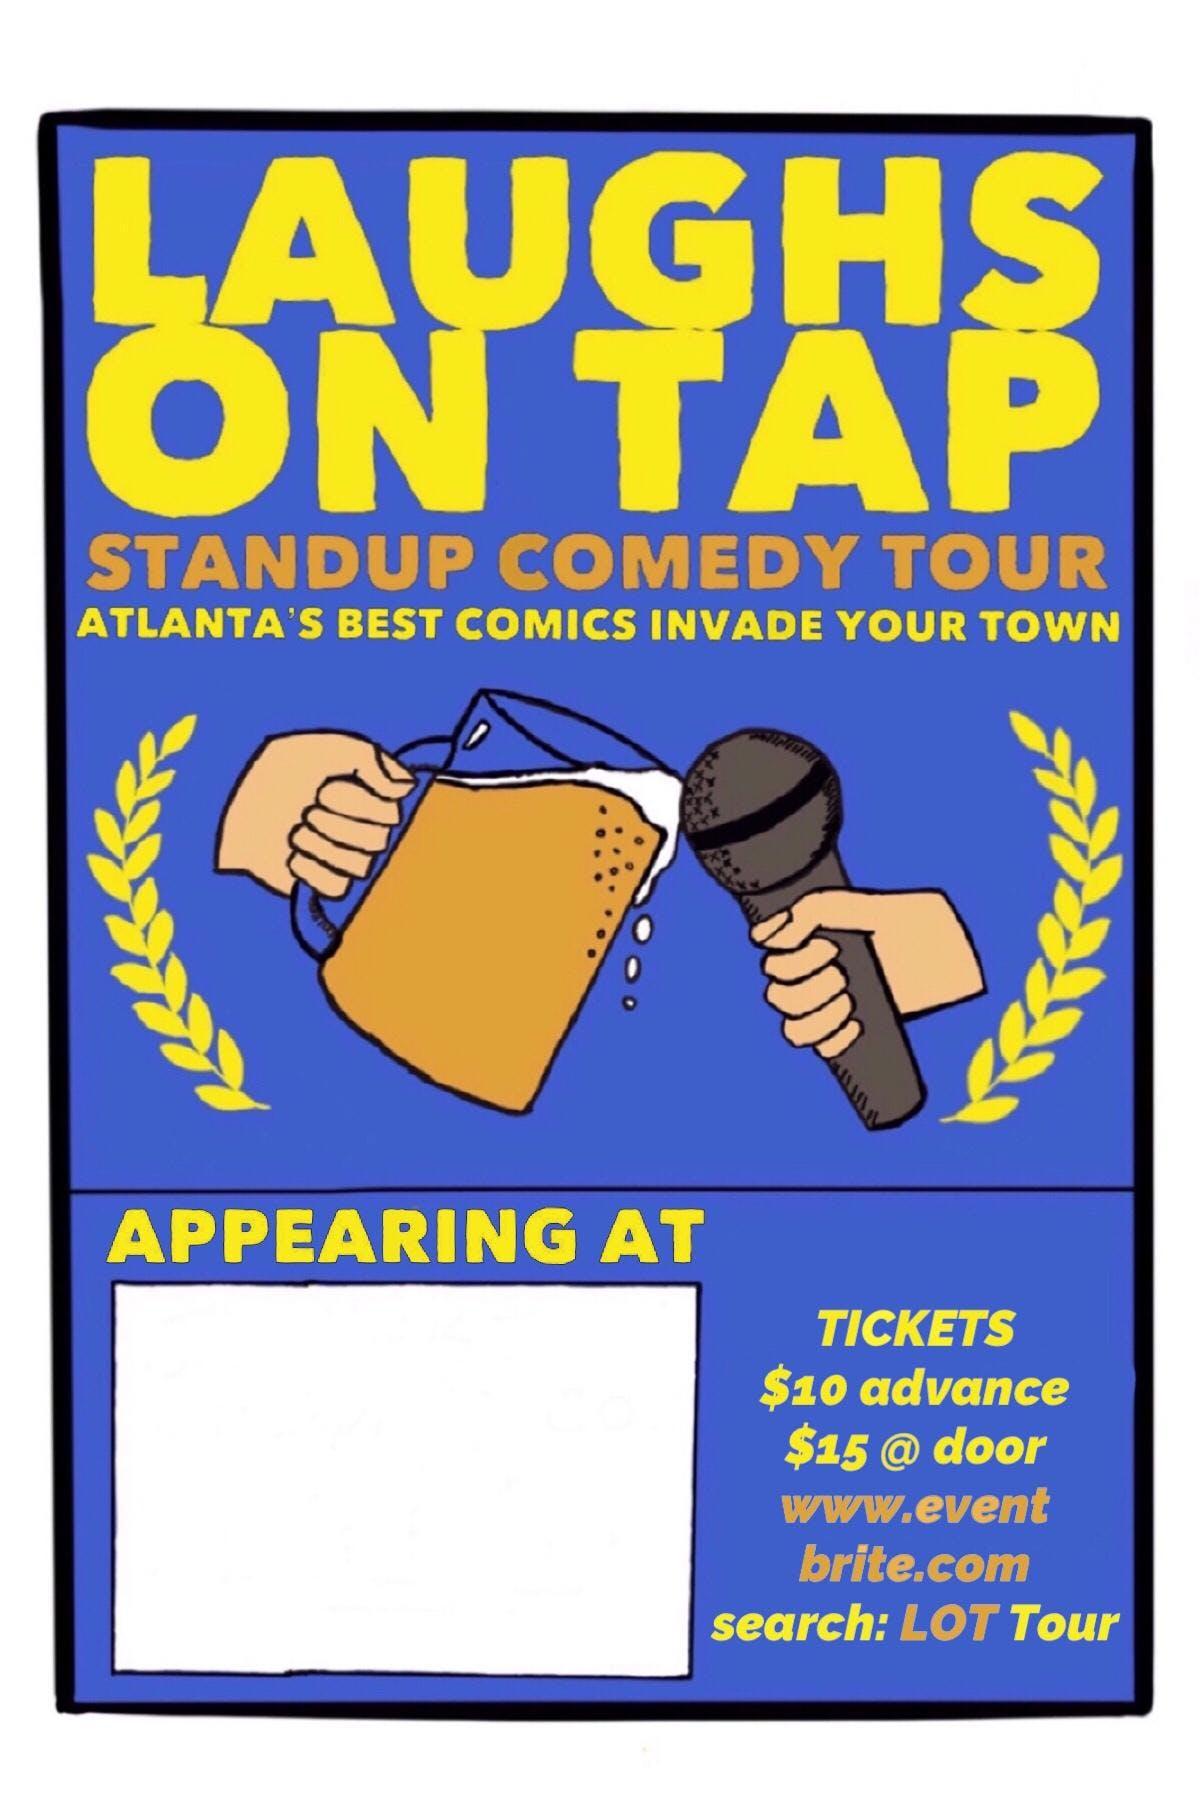 LOT Brewery Tour: Hoppy Trout 9:30PM